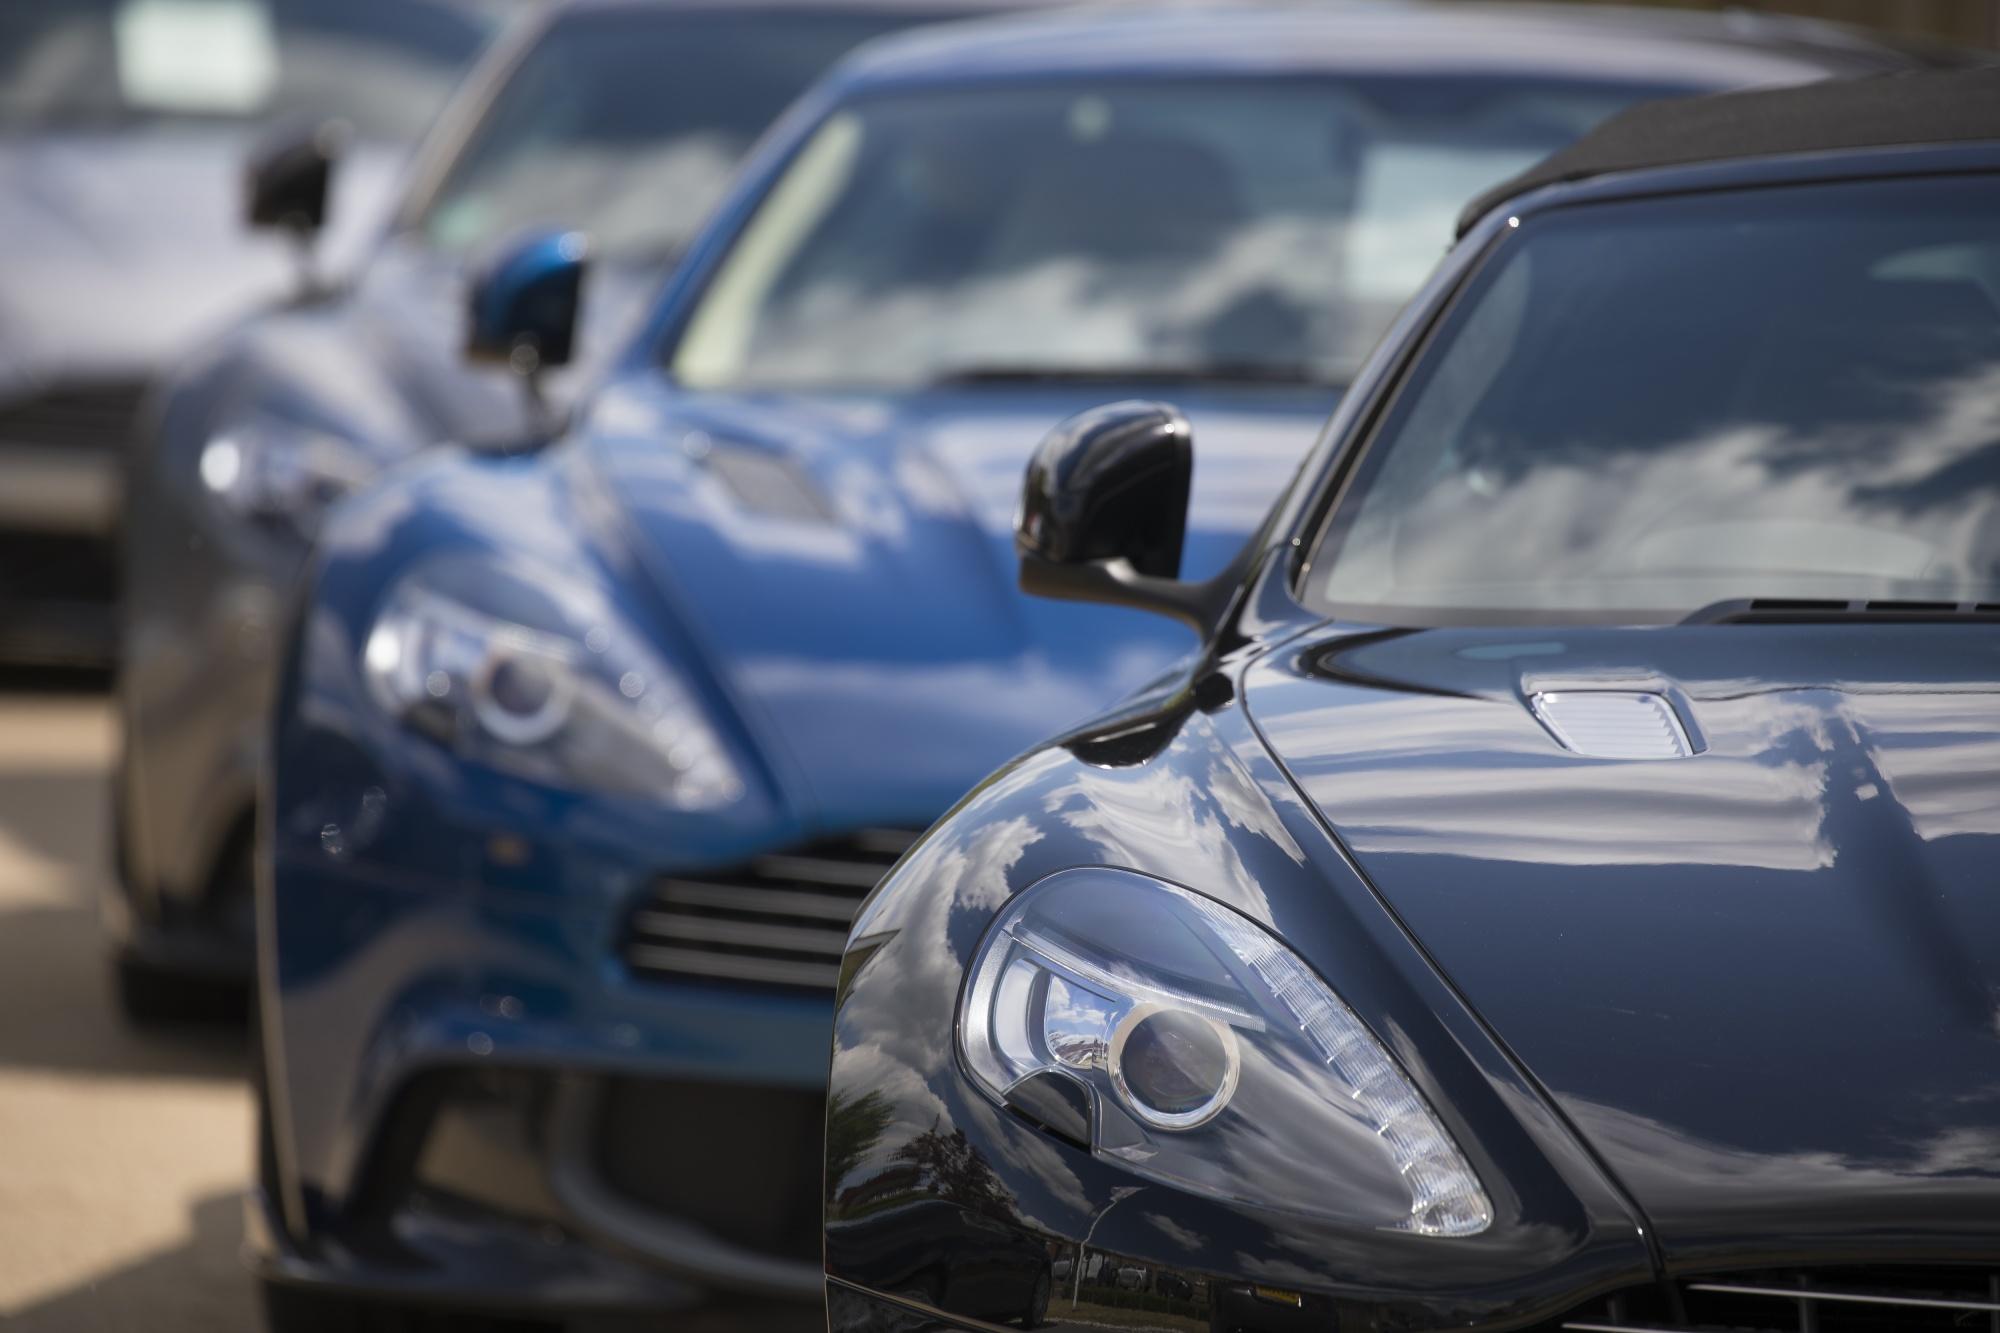 Aston Martin Faces Rebuke For Return To All Male Board Bloomberg